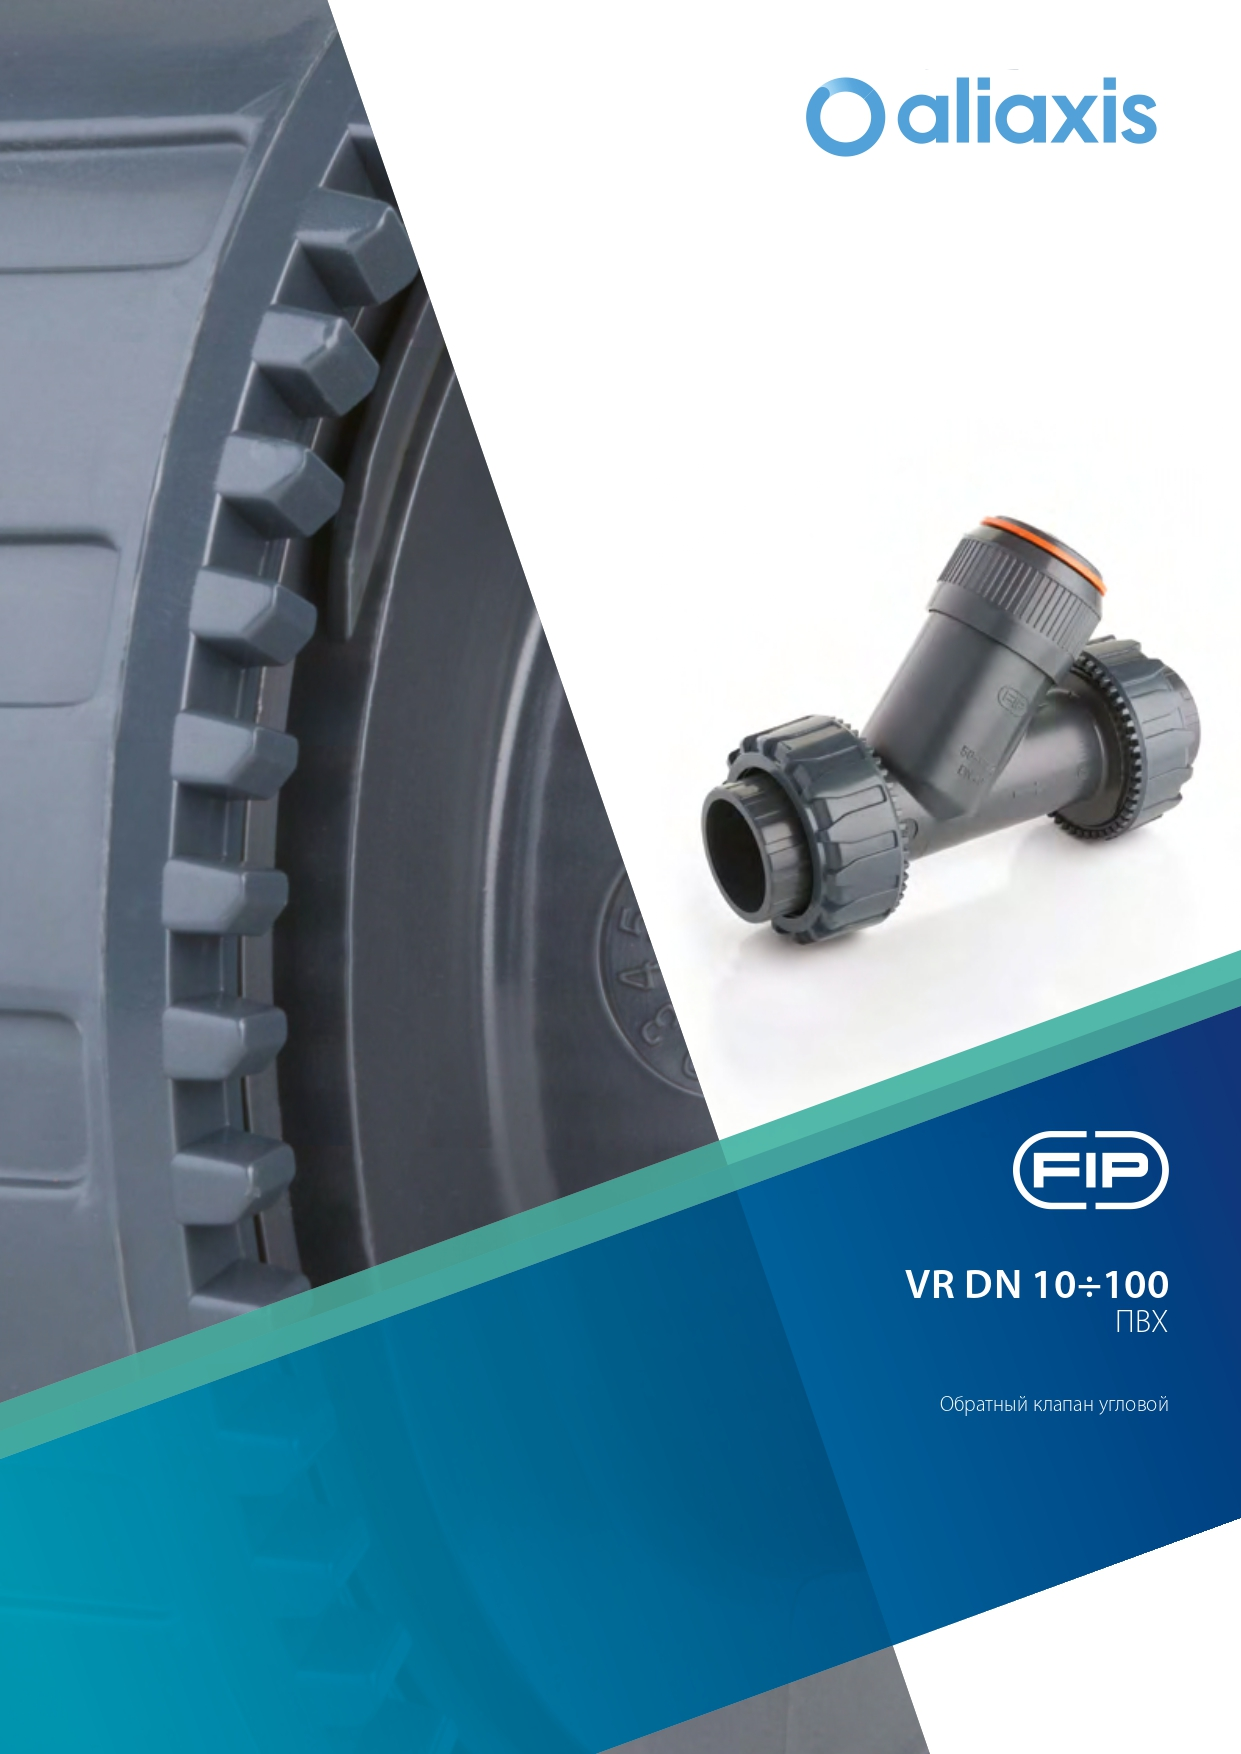 Угловые обратные клапаны VR DN15-100 из ПВХ